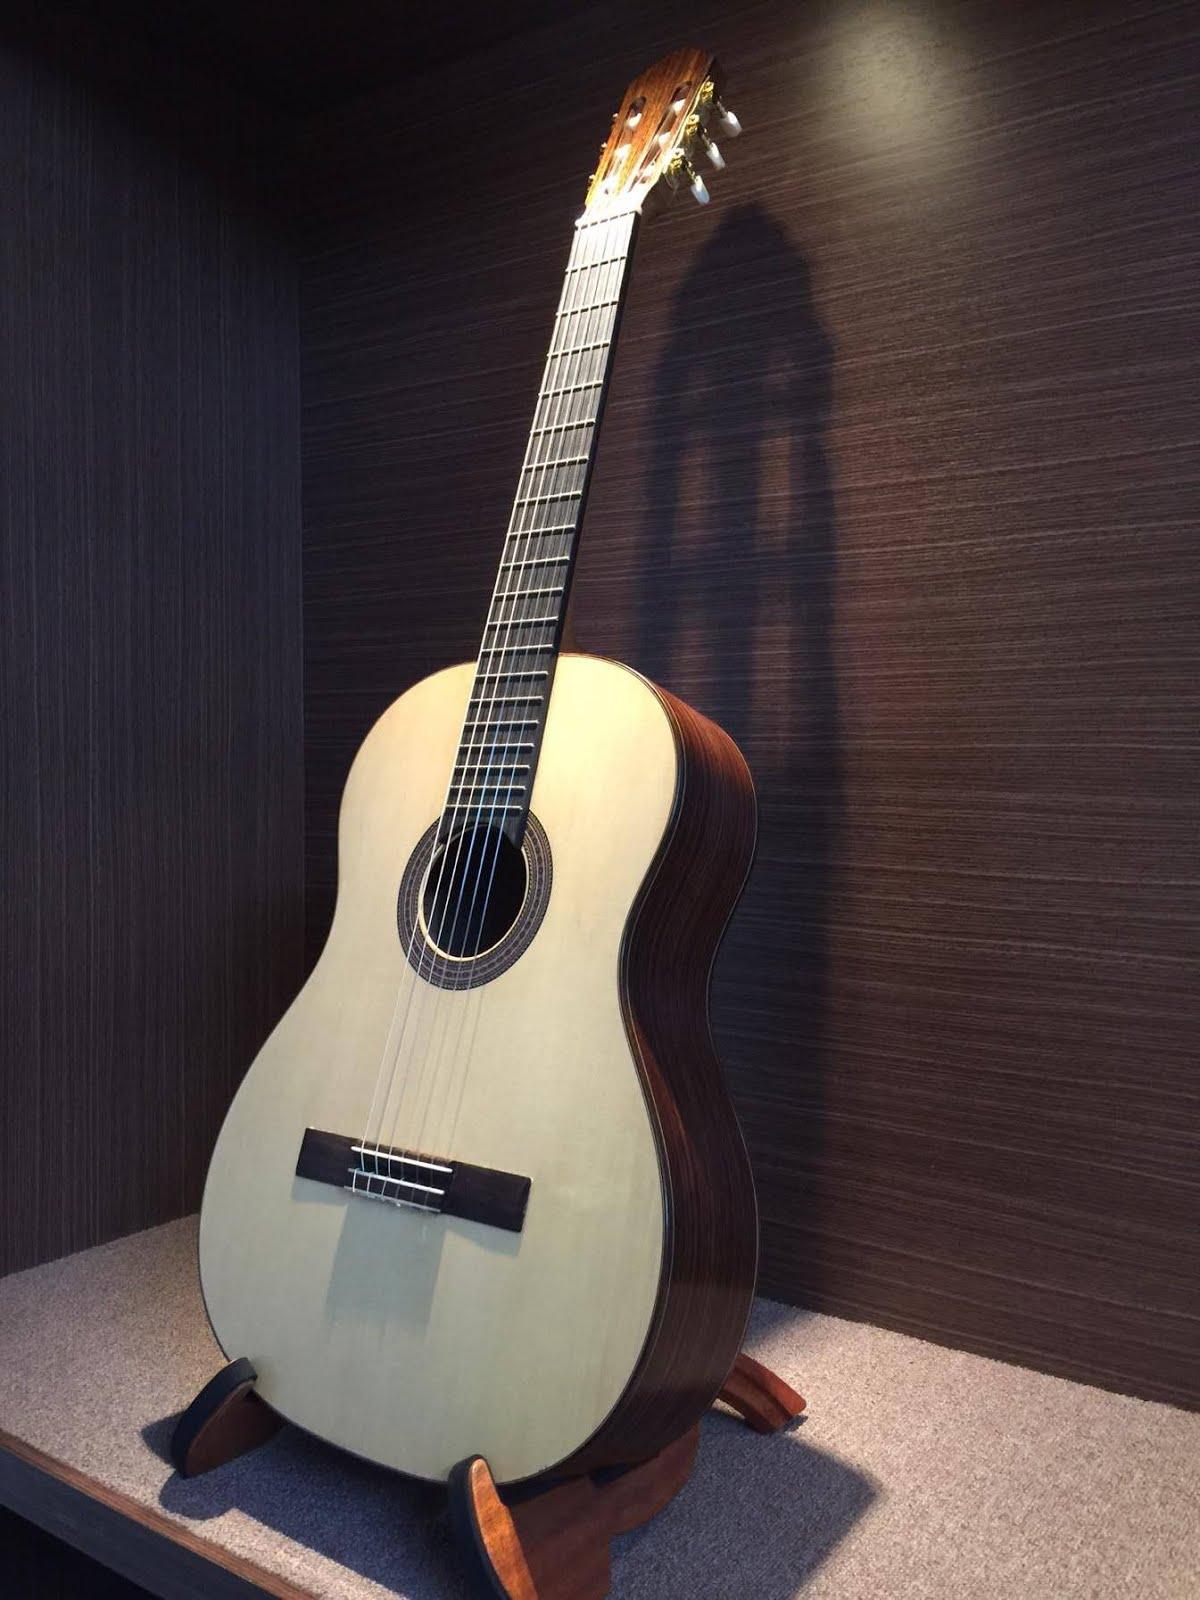 Torres托雷斯樂器股份有限公司: 臺灣吉他名匠 - 許峻源